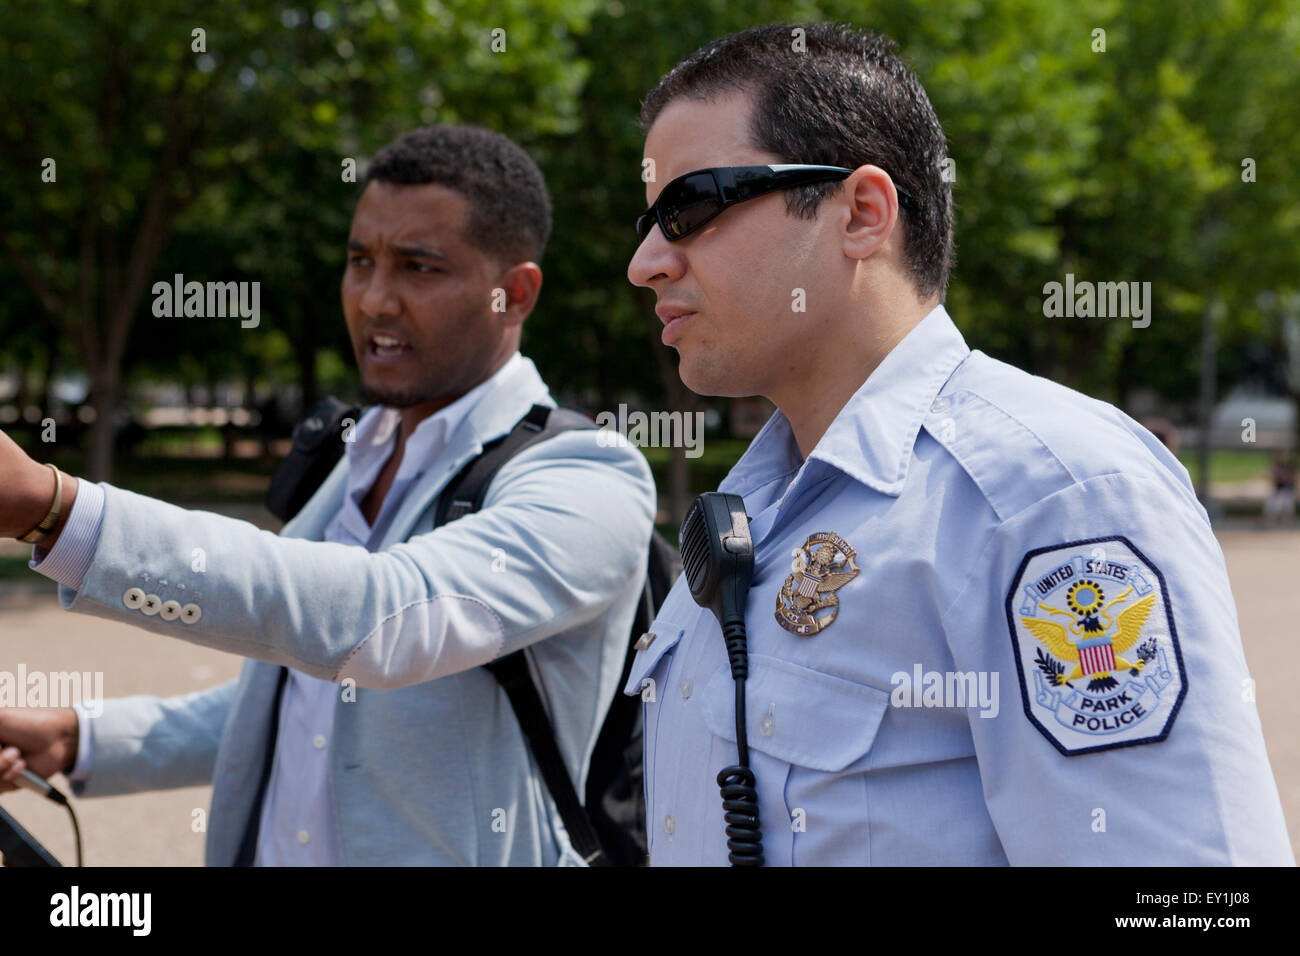 US Park Police officer talking with black civilian - Washington, DC USA - Stock Image